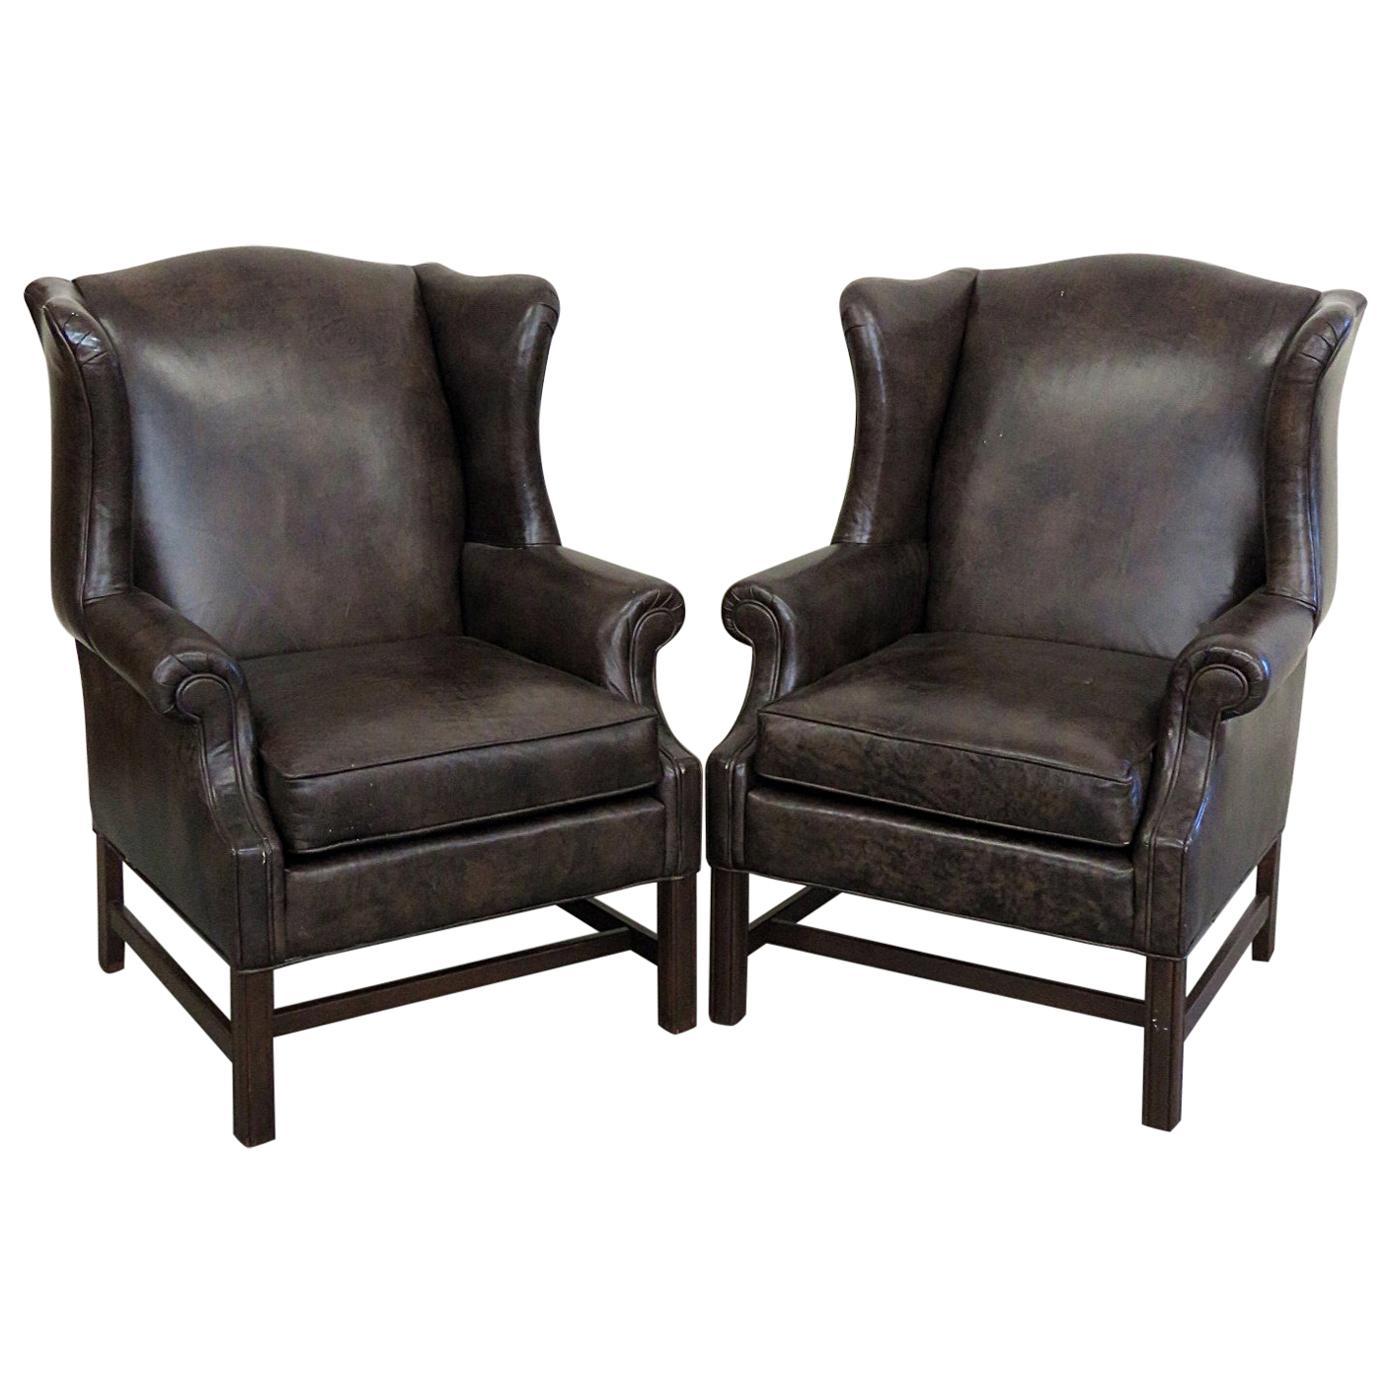 Ethan Allen Furniture   12 For Sale At 1stdibs